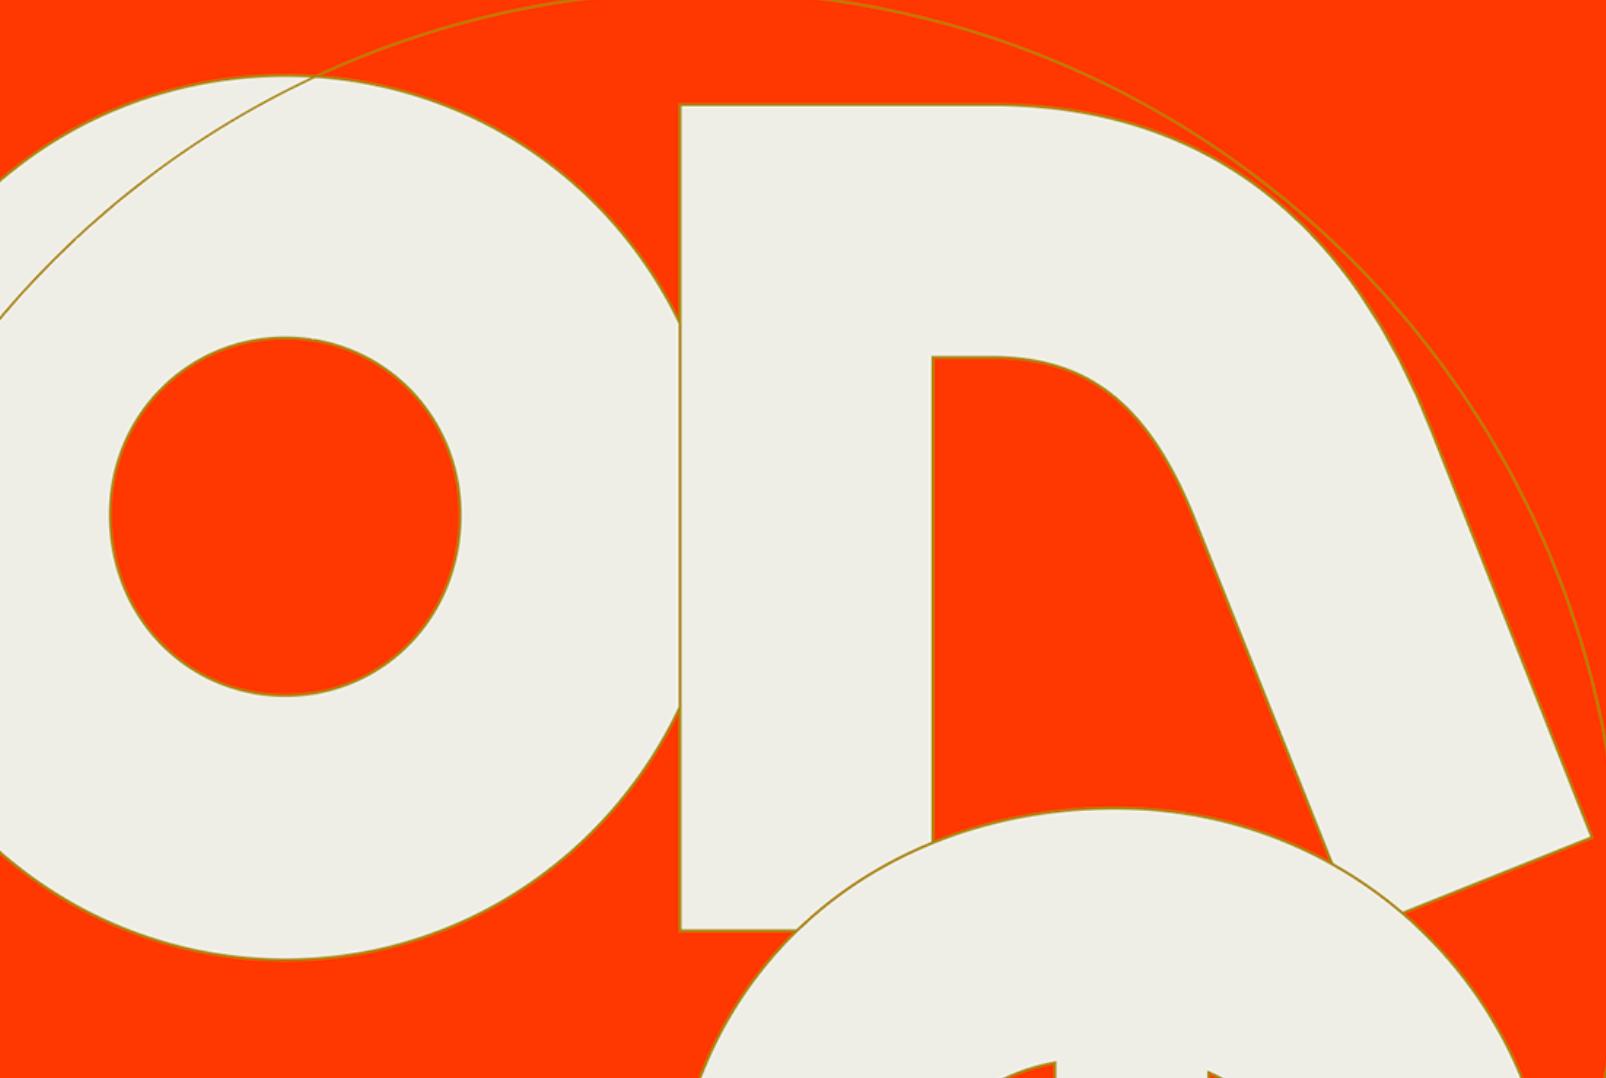 Kobe Typeface